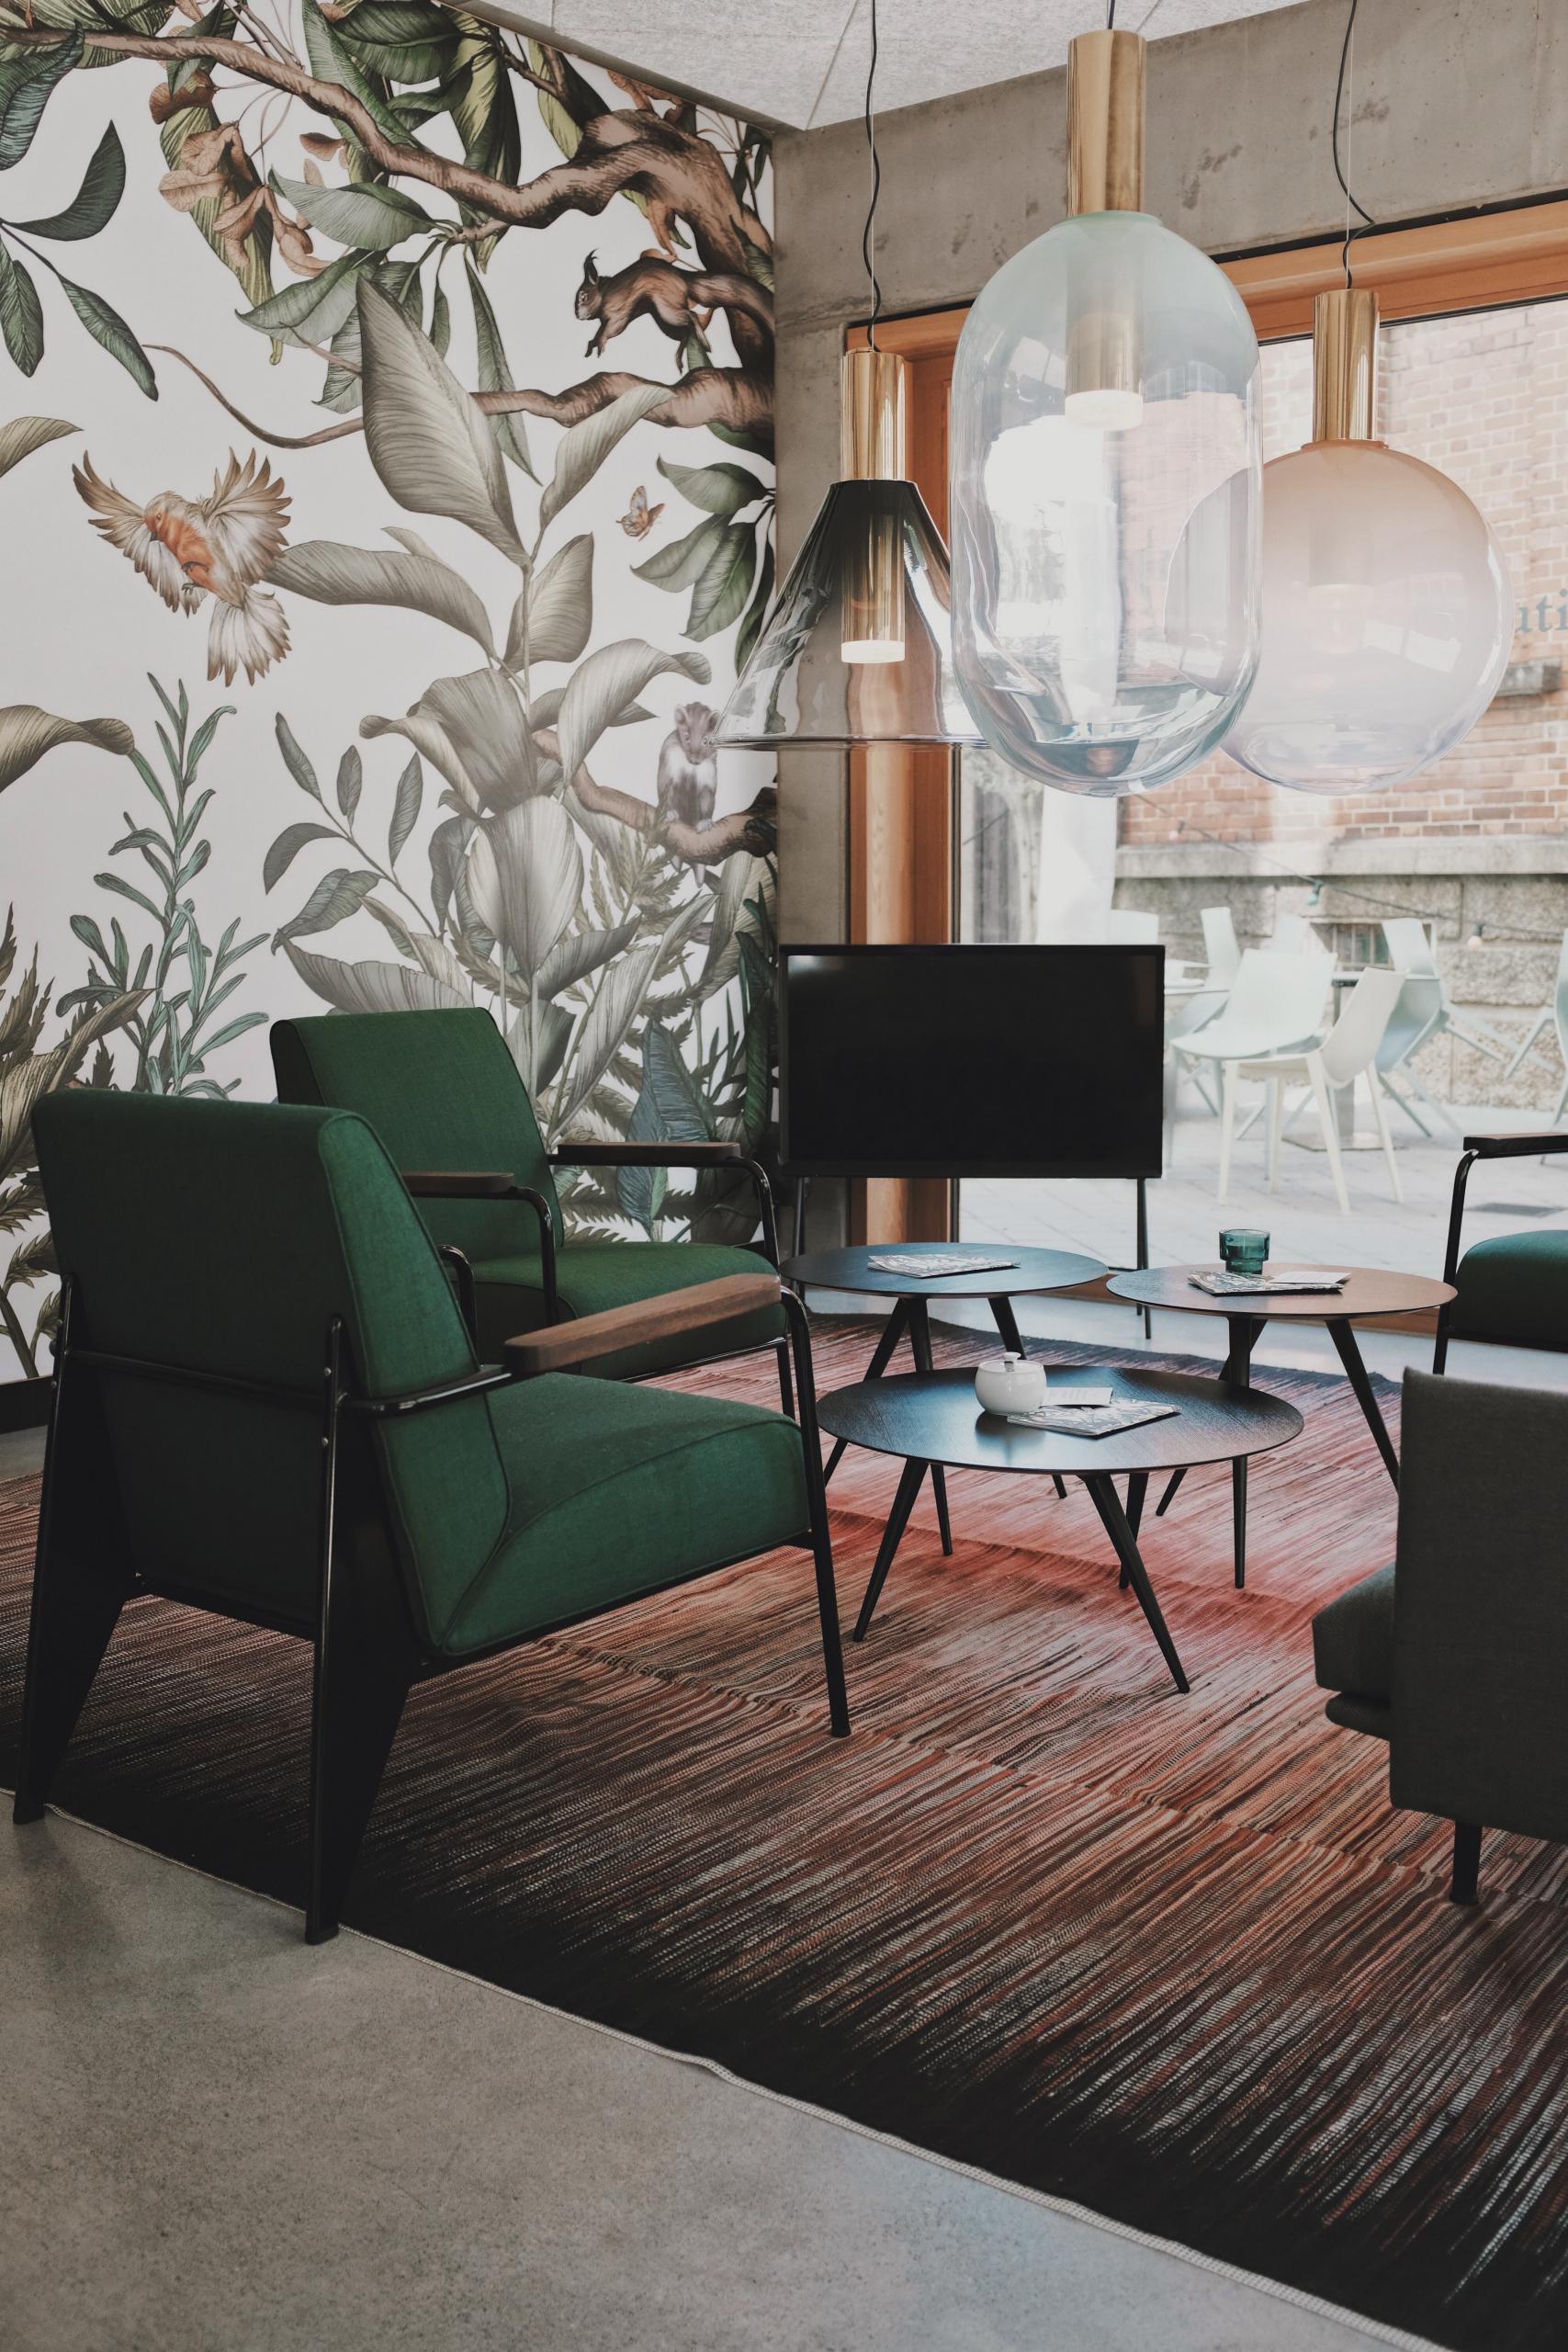 roller tapeten graue tapete moderne tapeten für wohnzimmer tapetenshop mowade de tapete blätter wald grüne möbel große lampen holzboden